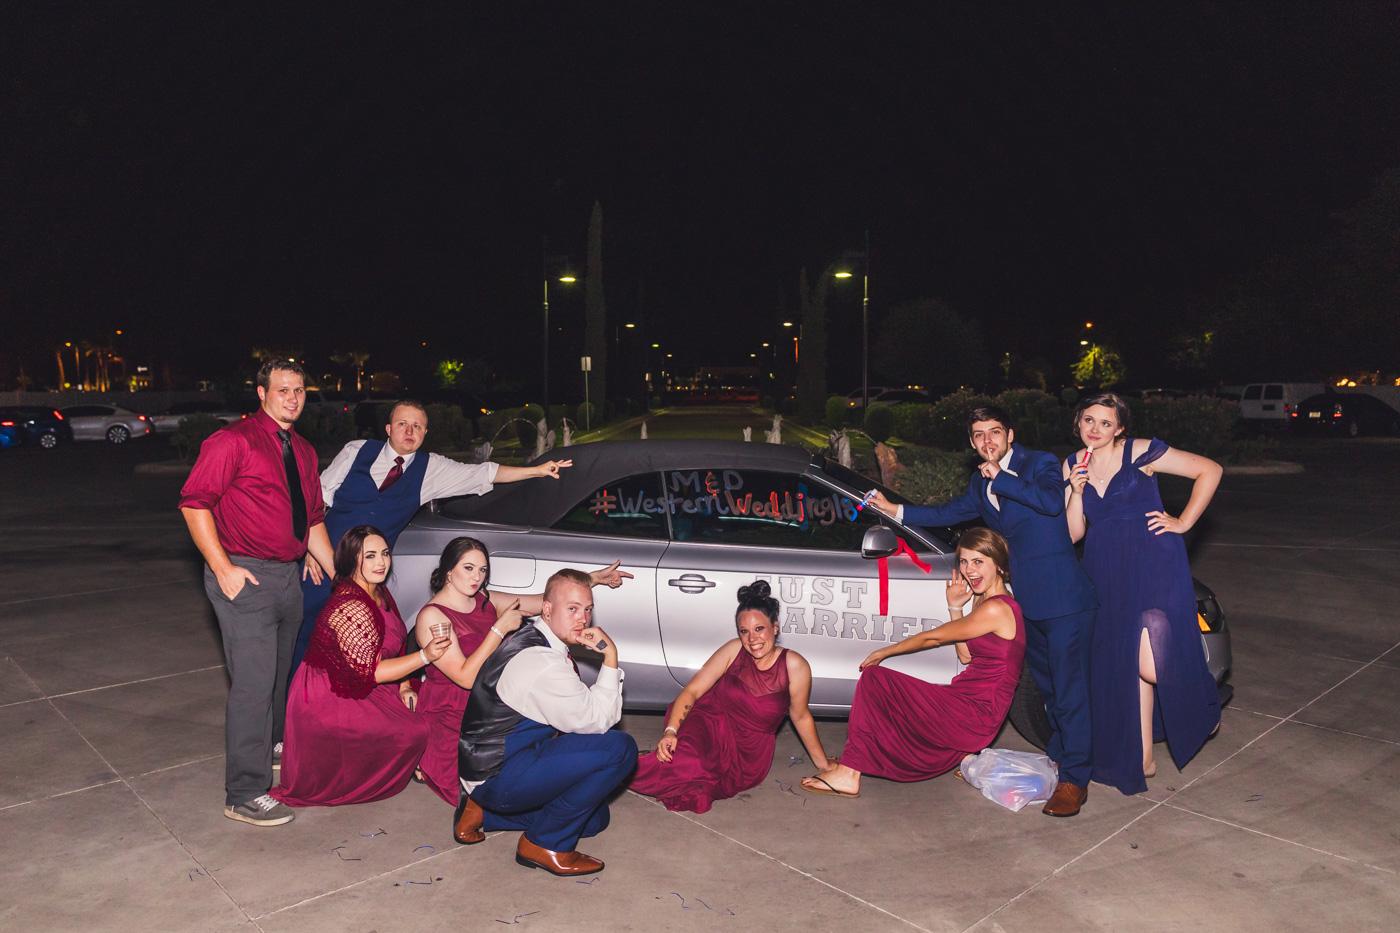 wedding-party-decorates-car